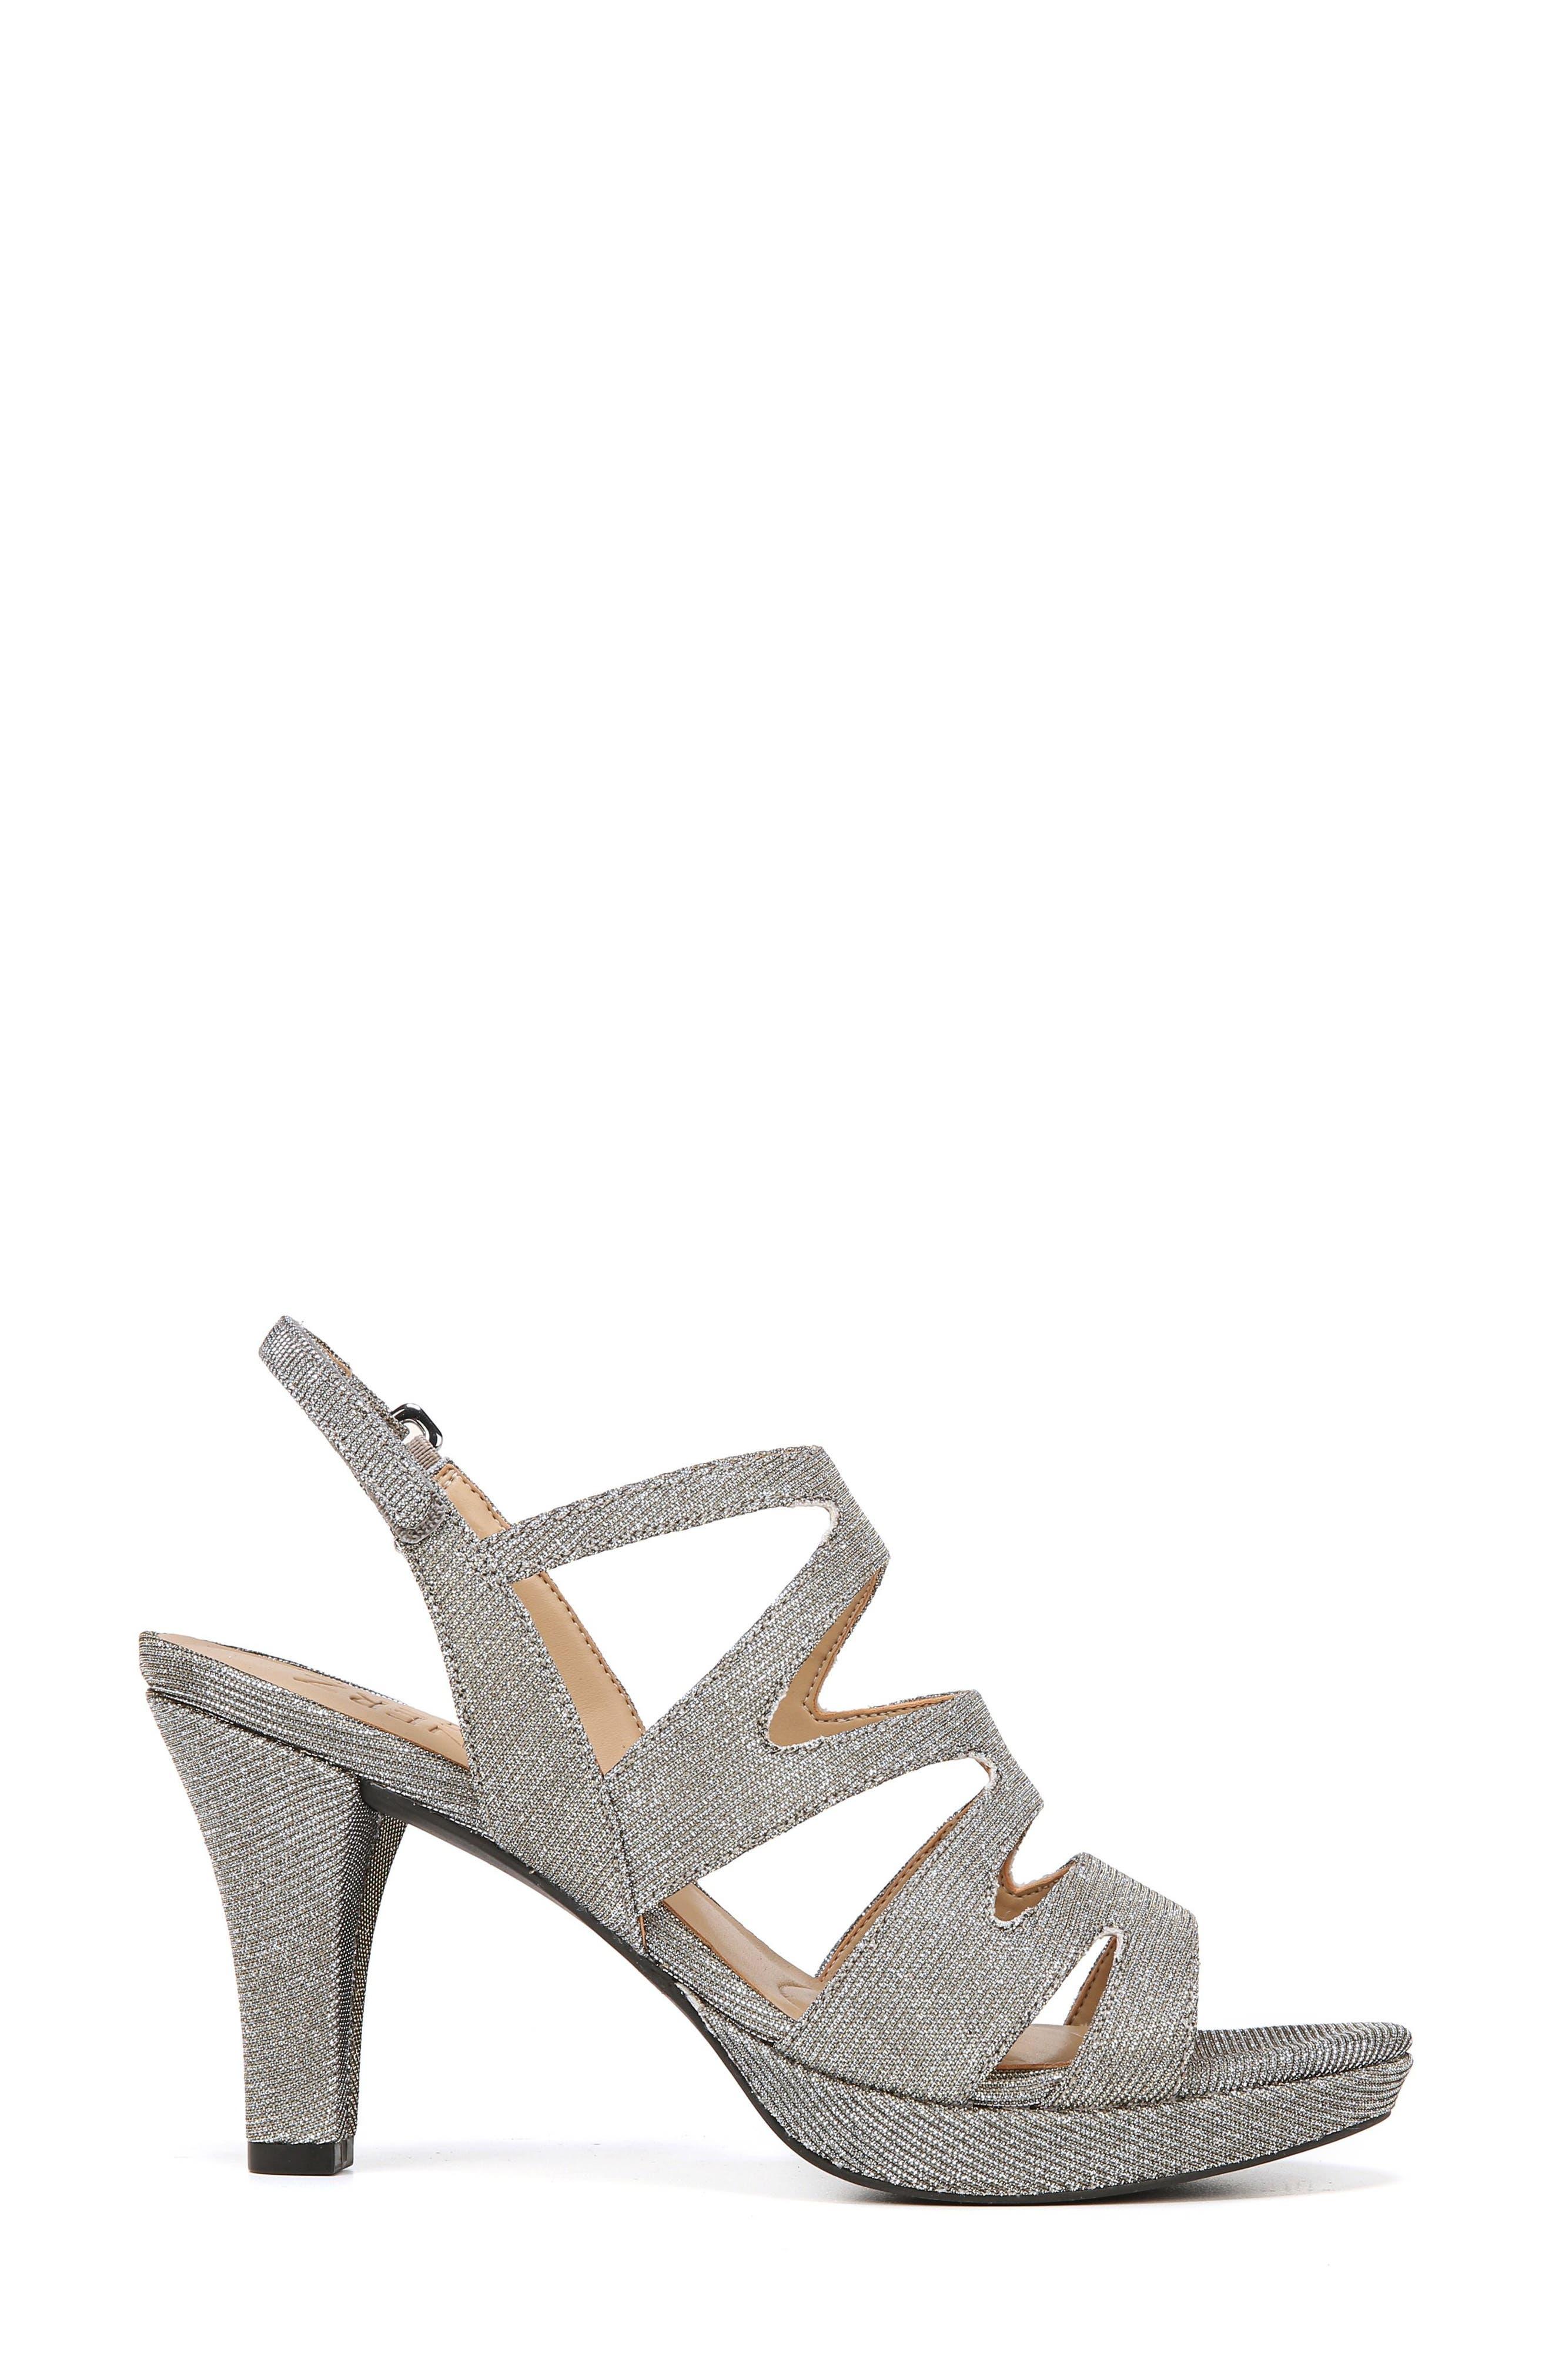 'Pressley' Slingback Platform Sandal,                             Alternate thumbnail 3, color,                             Alloy Sparkle Fabric